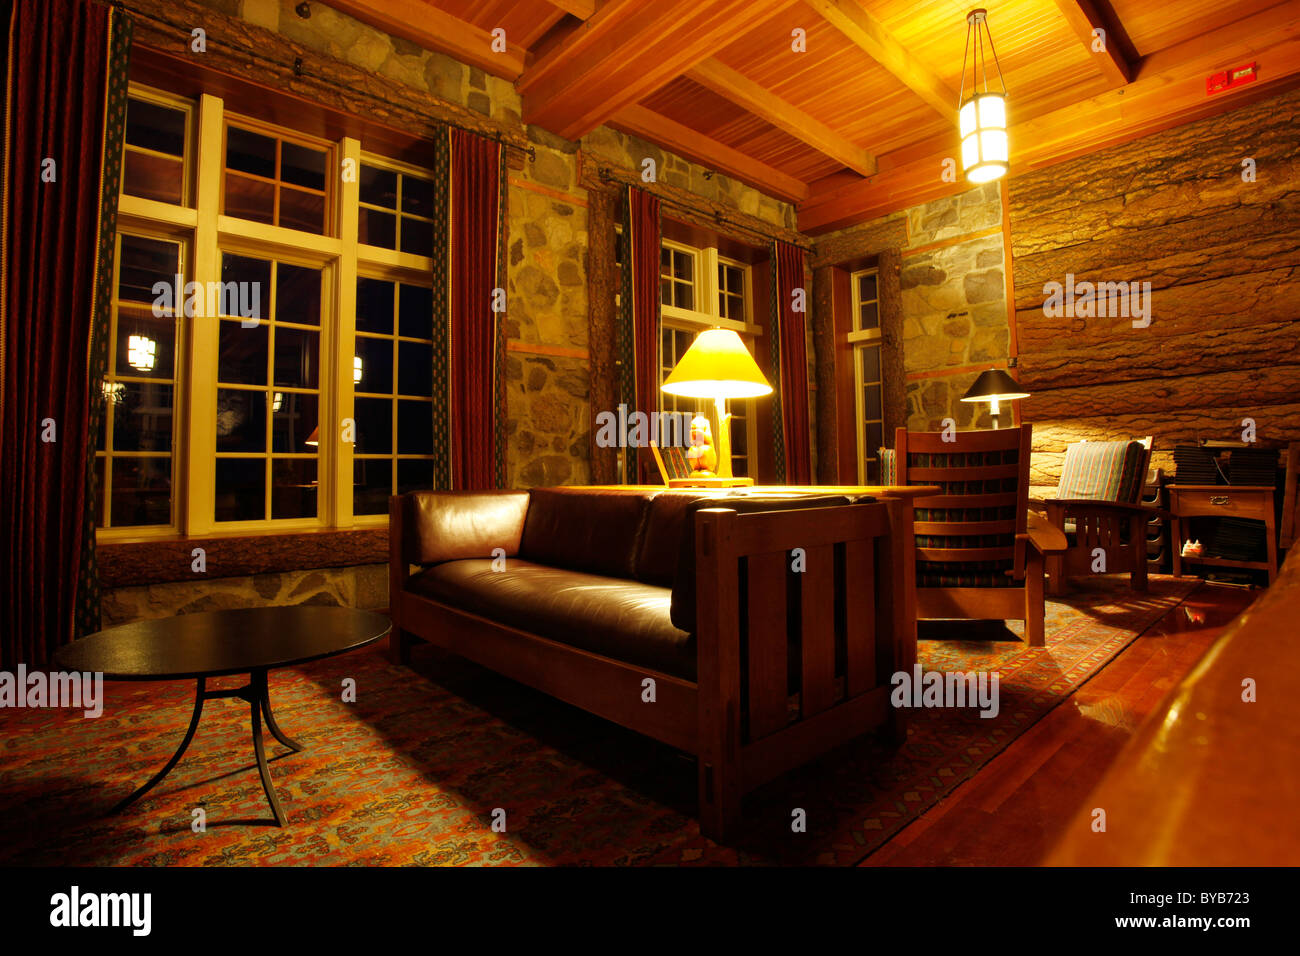 Sun Valley Lodge Dining Room Lake Lodge Stock Photos Amp Lake Lodge Stock Images Alamy